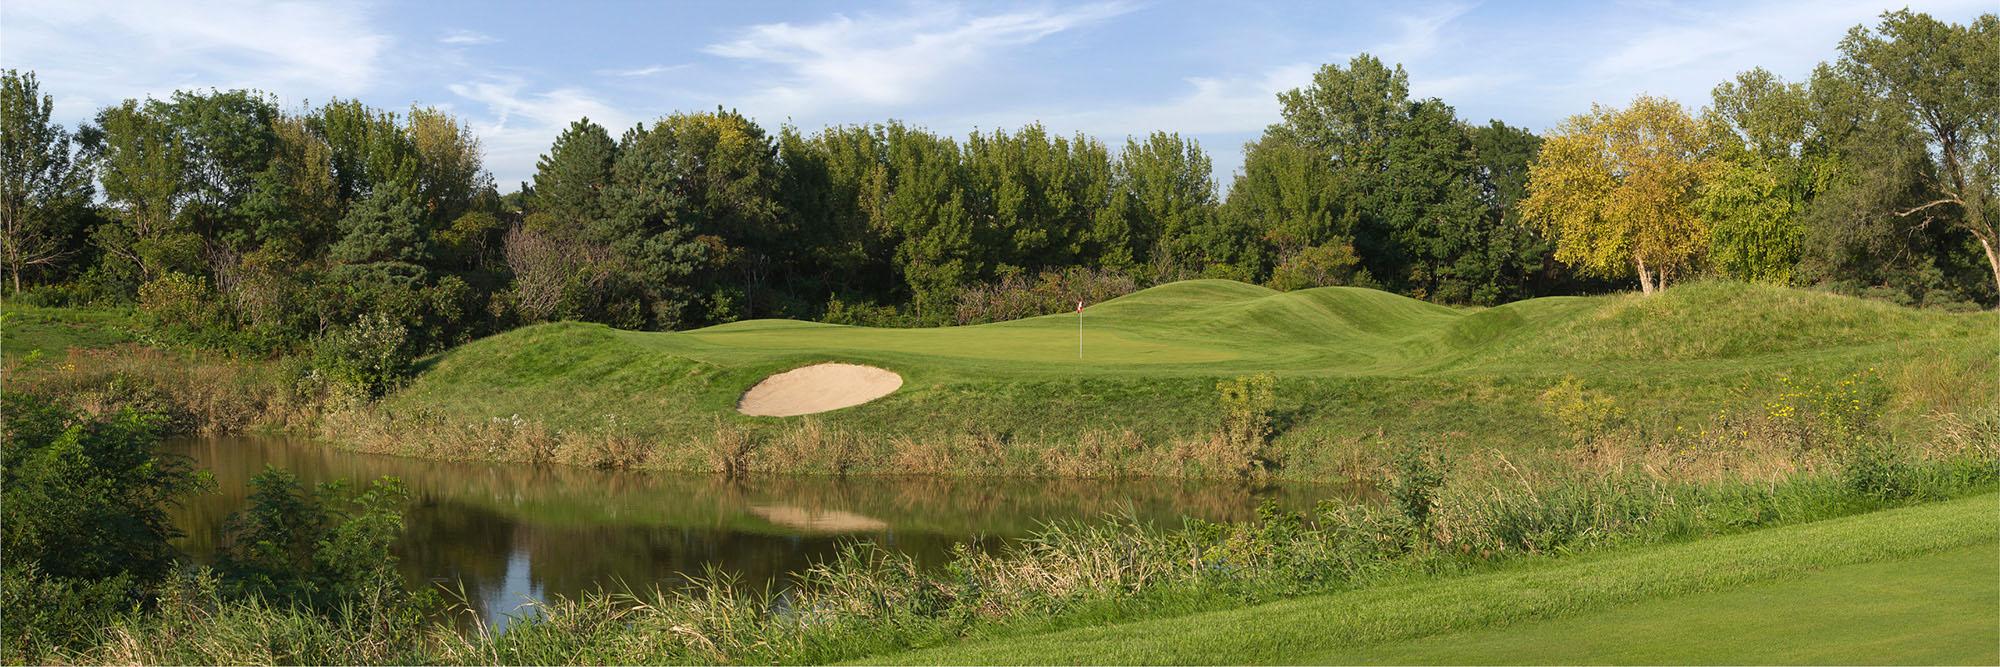 Golf Course Image - Champions Run No. 12